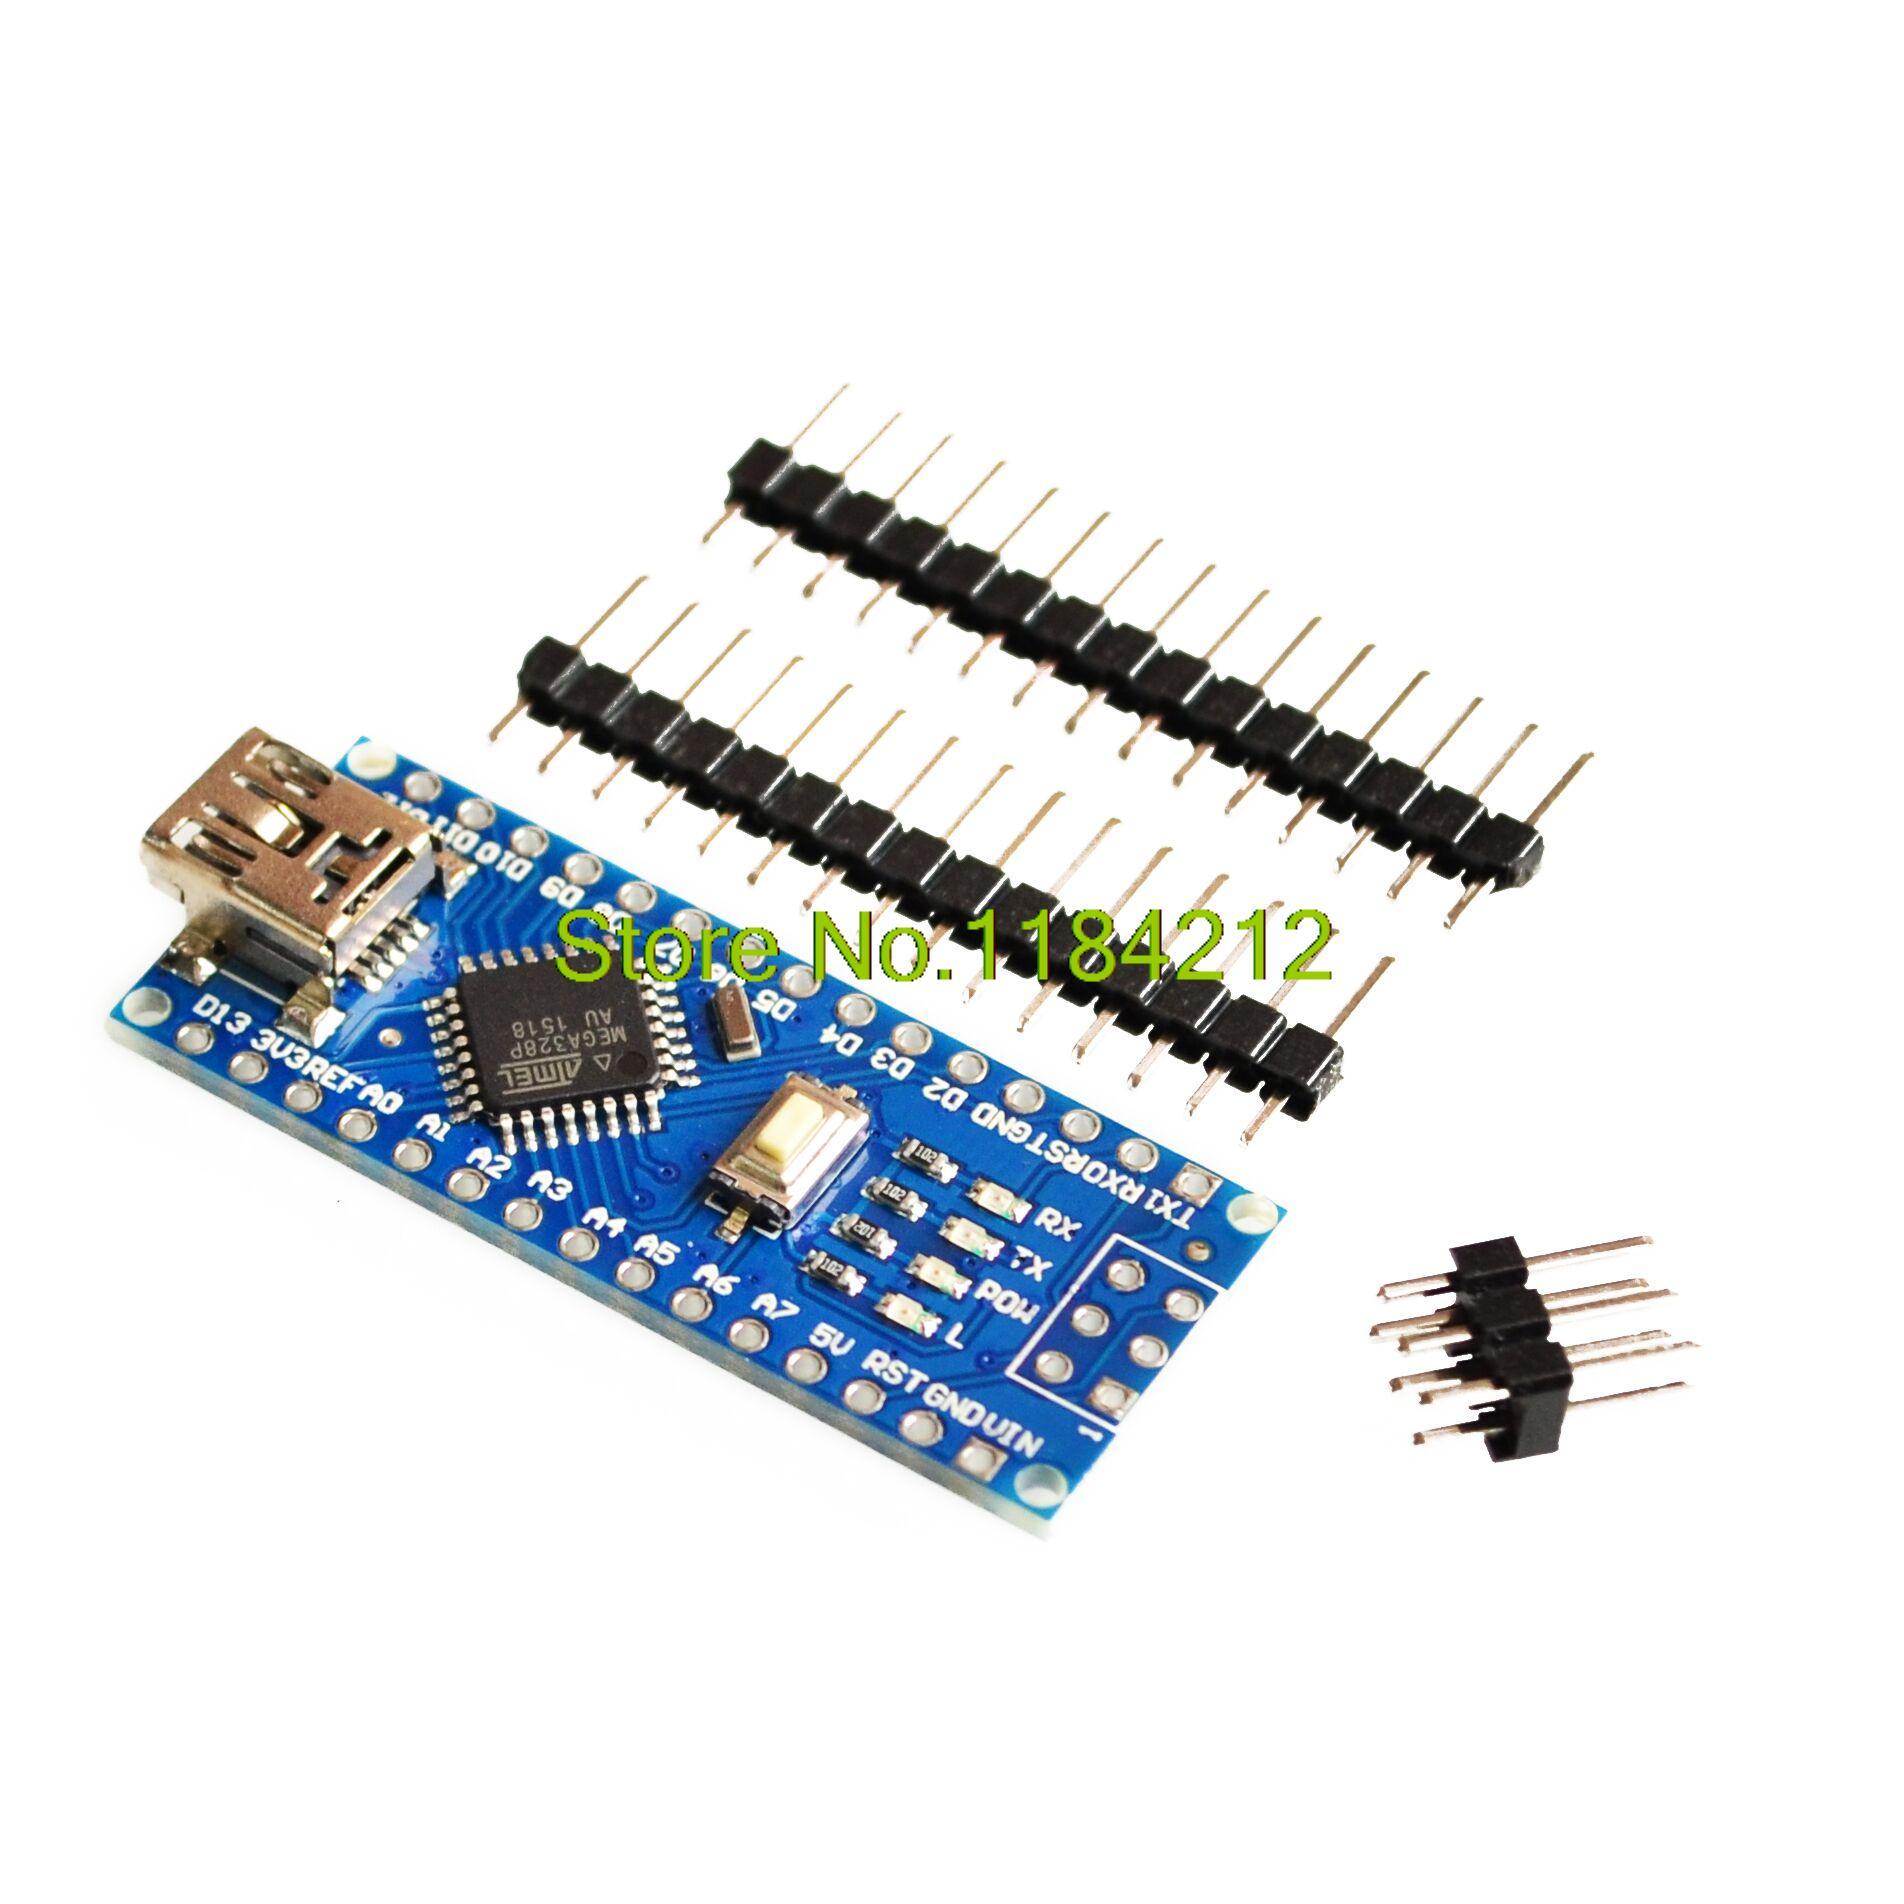 1PCS For Arduino Nano 3.0  Promotion Atmega328 Controller Compatible Board For Arduino Module PCB Development Board Without USB